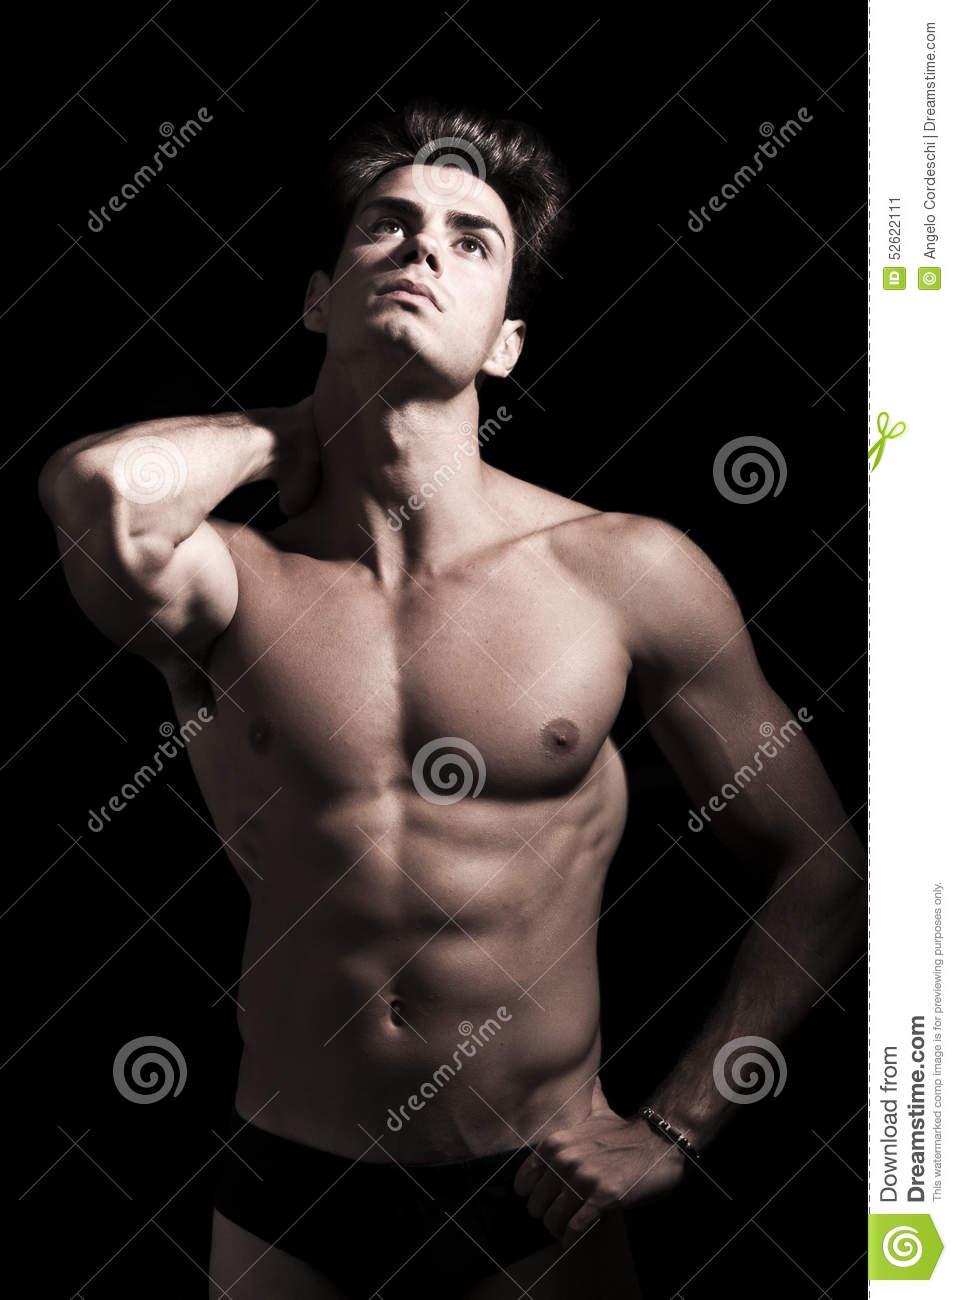 Marisa nude marissa miller